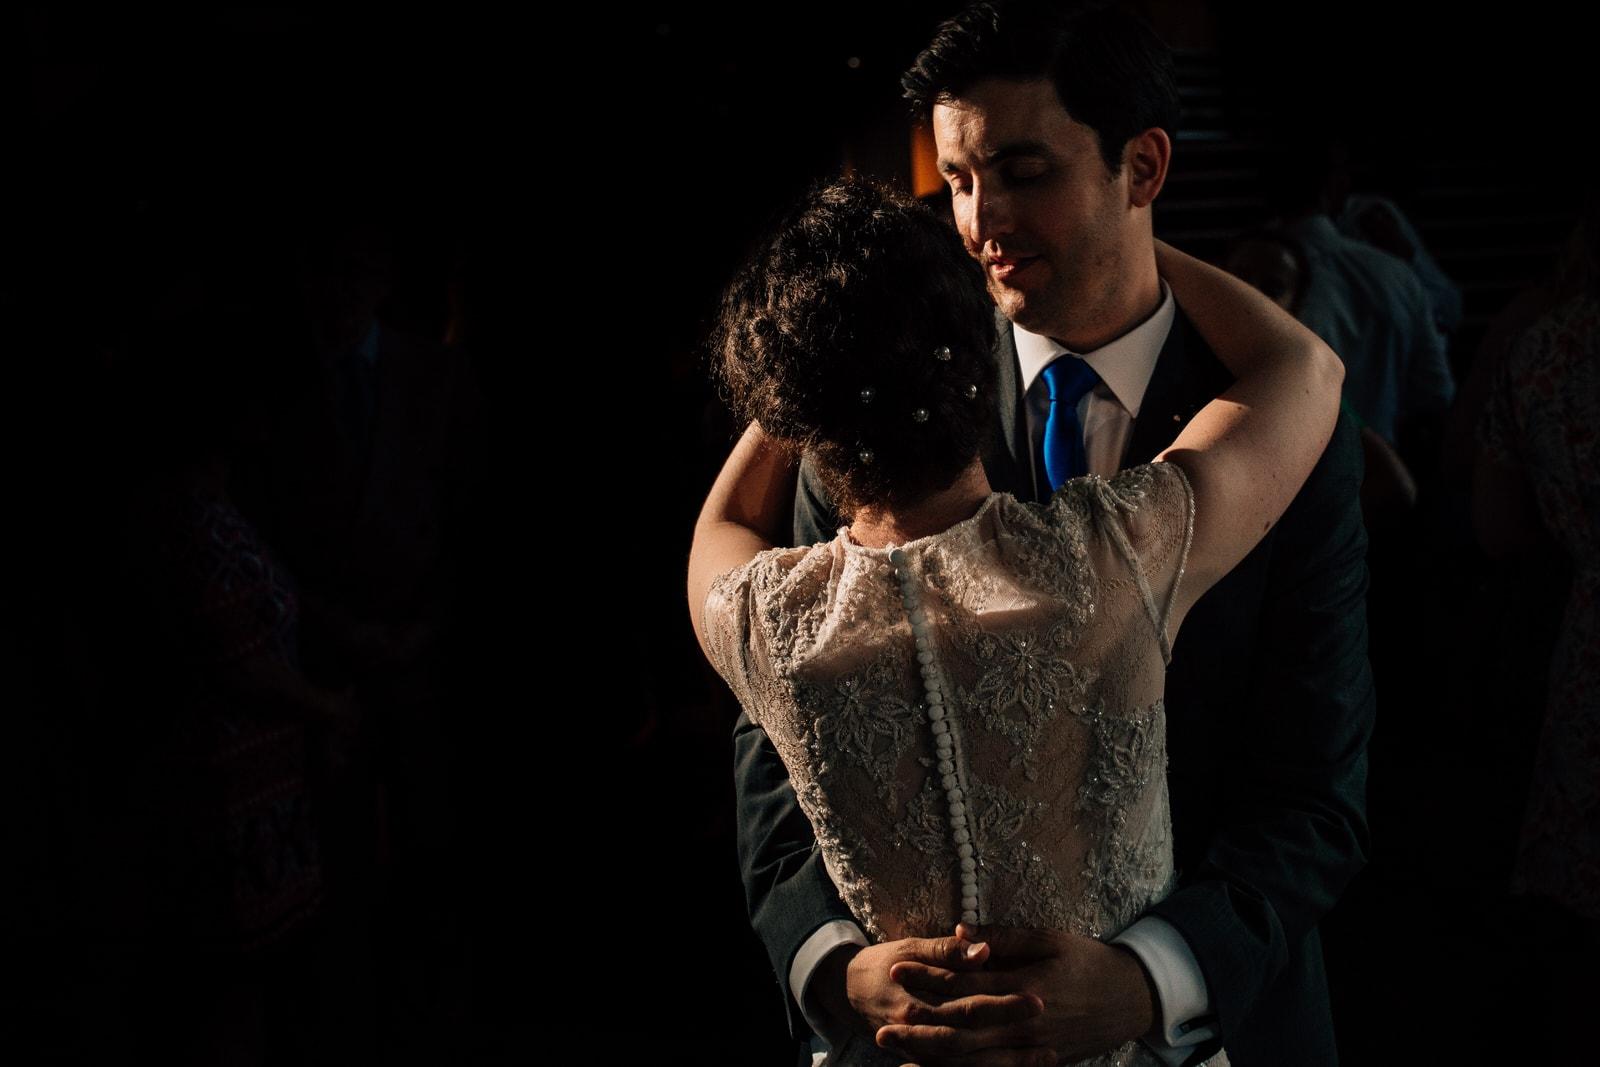 Essendon Country Club wedding photography